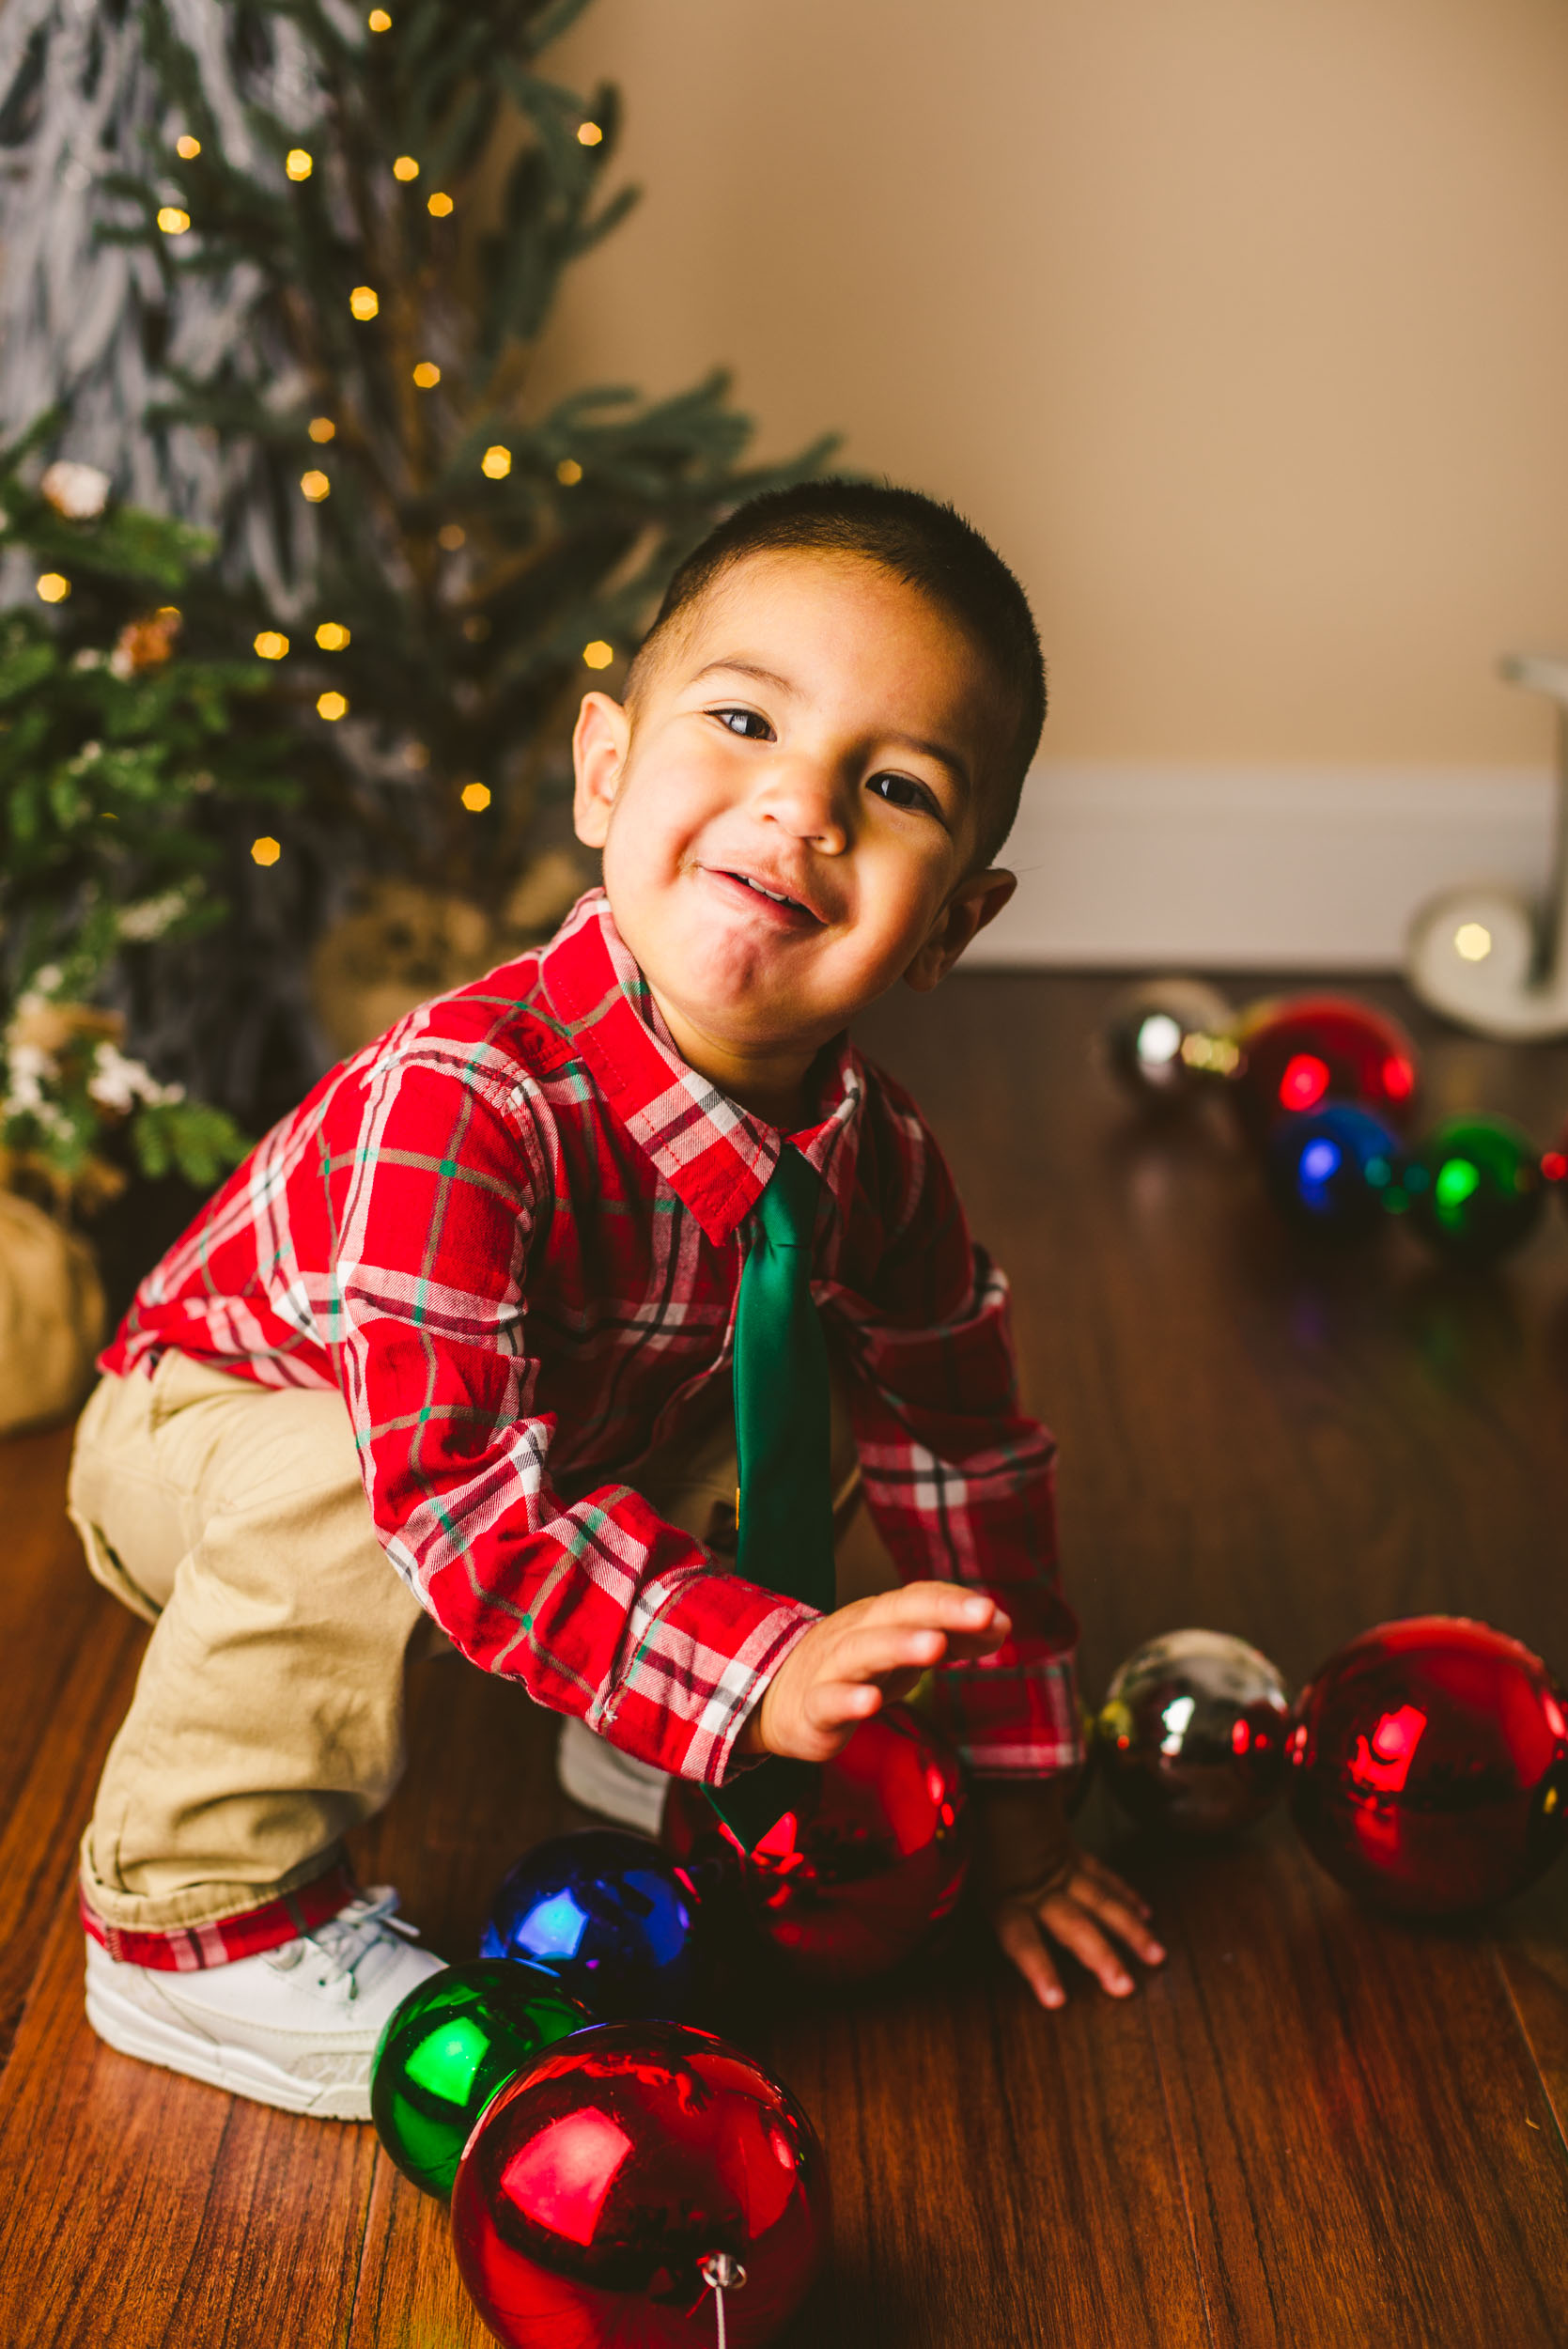 long-island-photographer-families-kids-christmas-mini-sessions-holiday-snow-lights-1.jpg